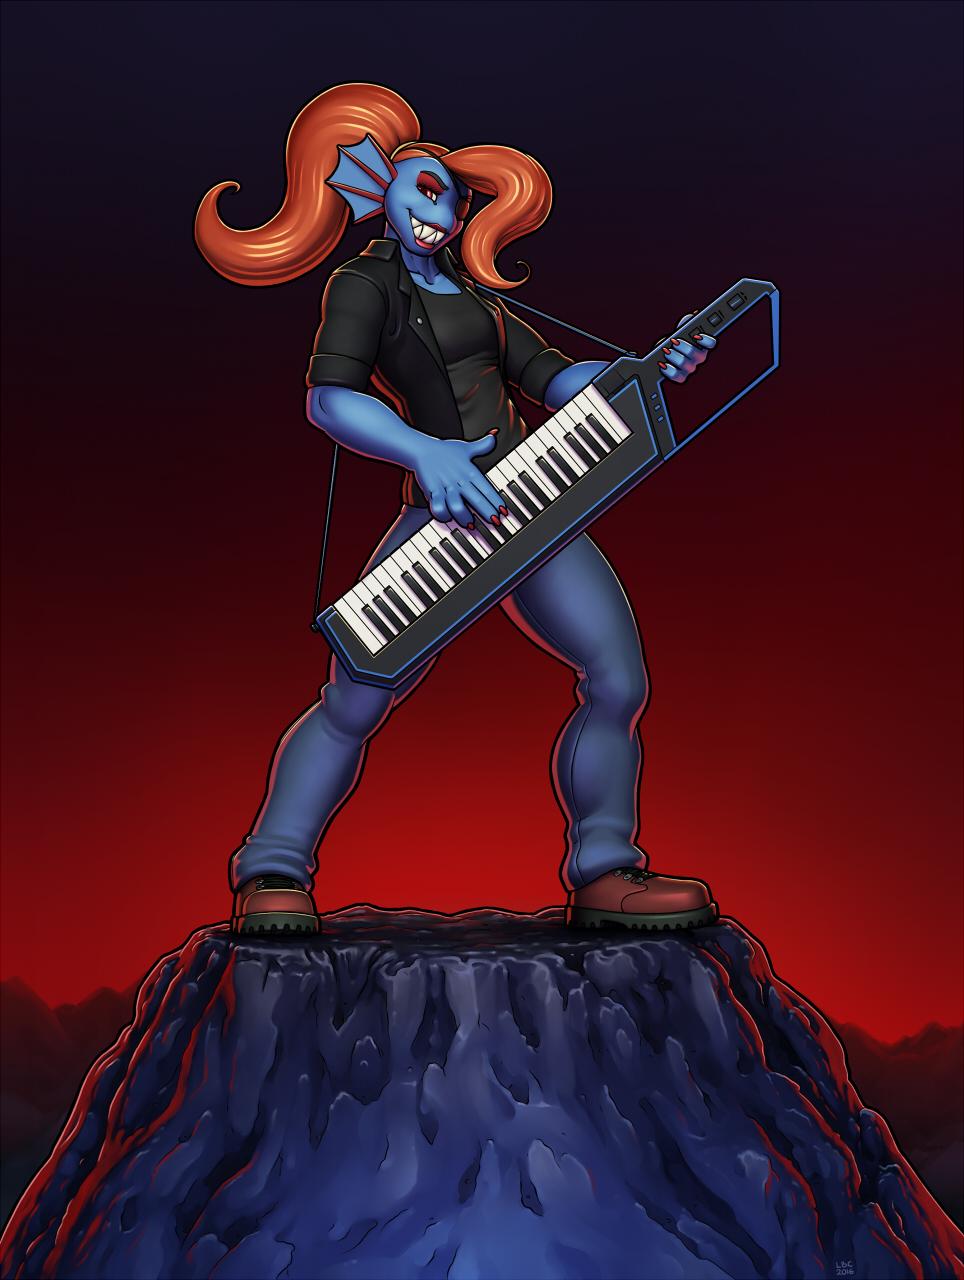 Undyne the Keytarist